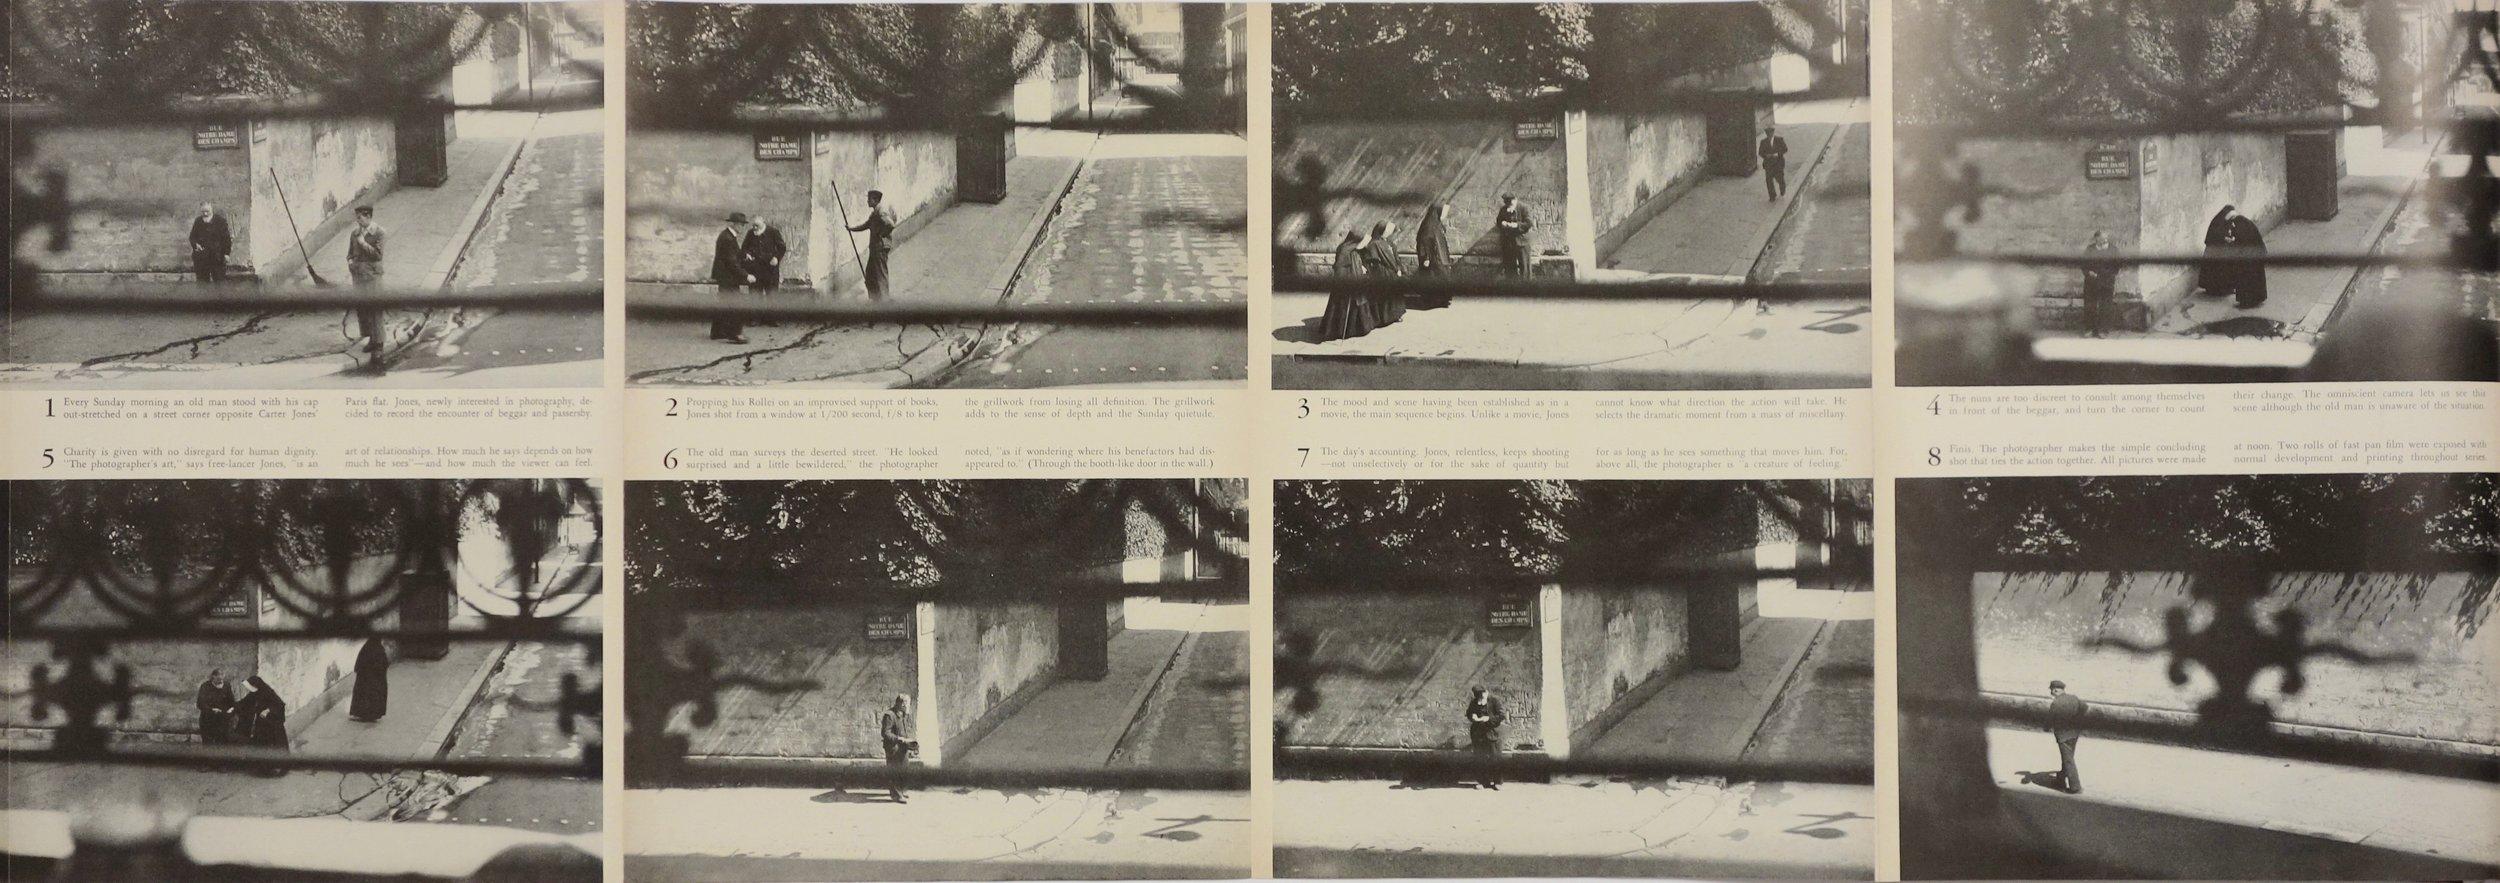 carterjones.uscamera1954